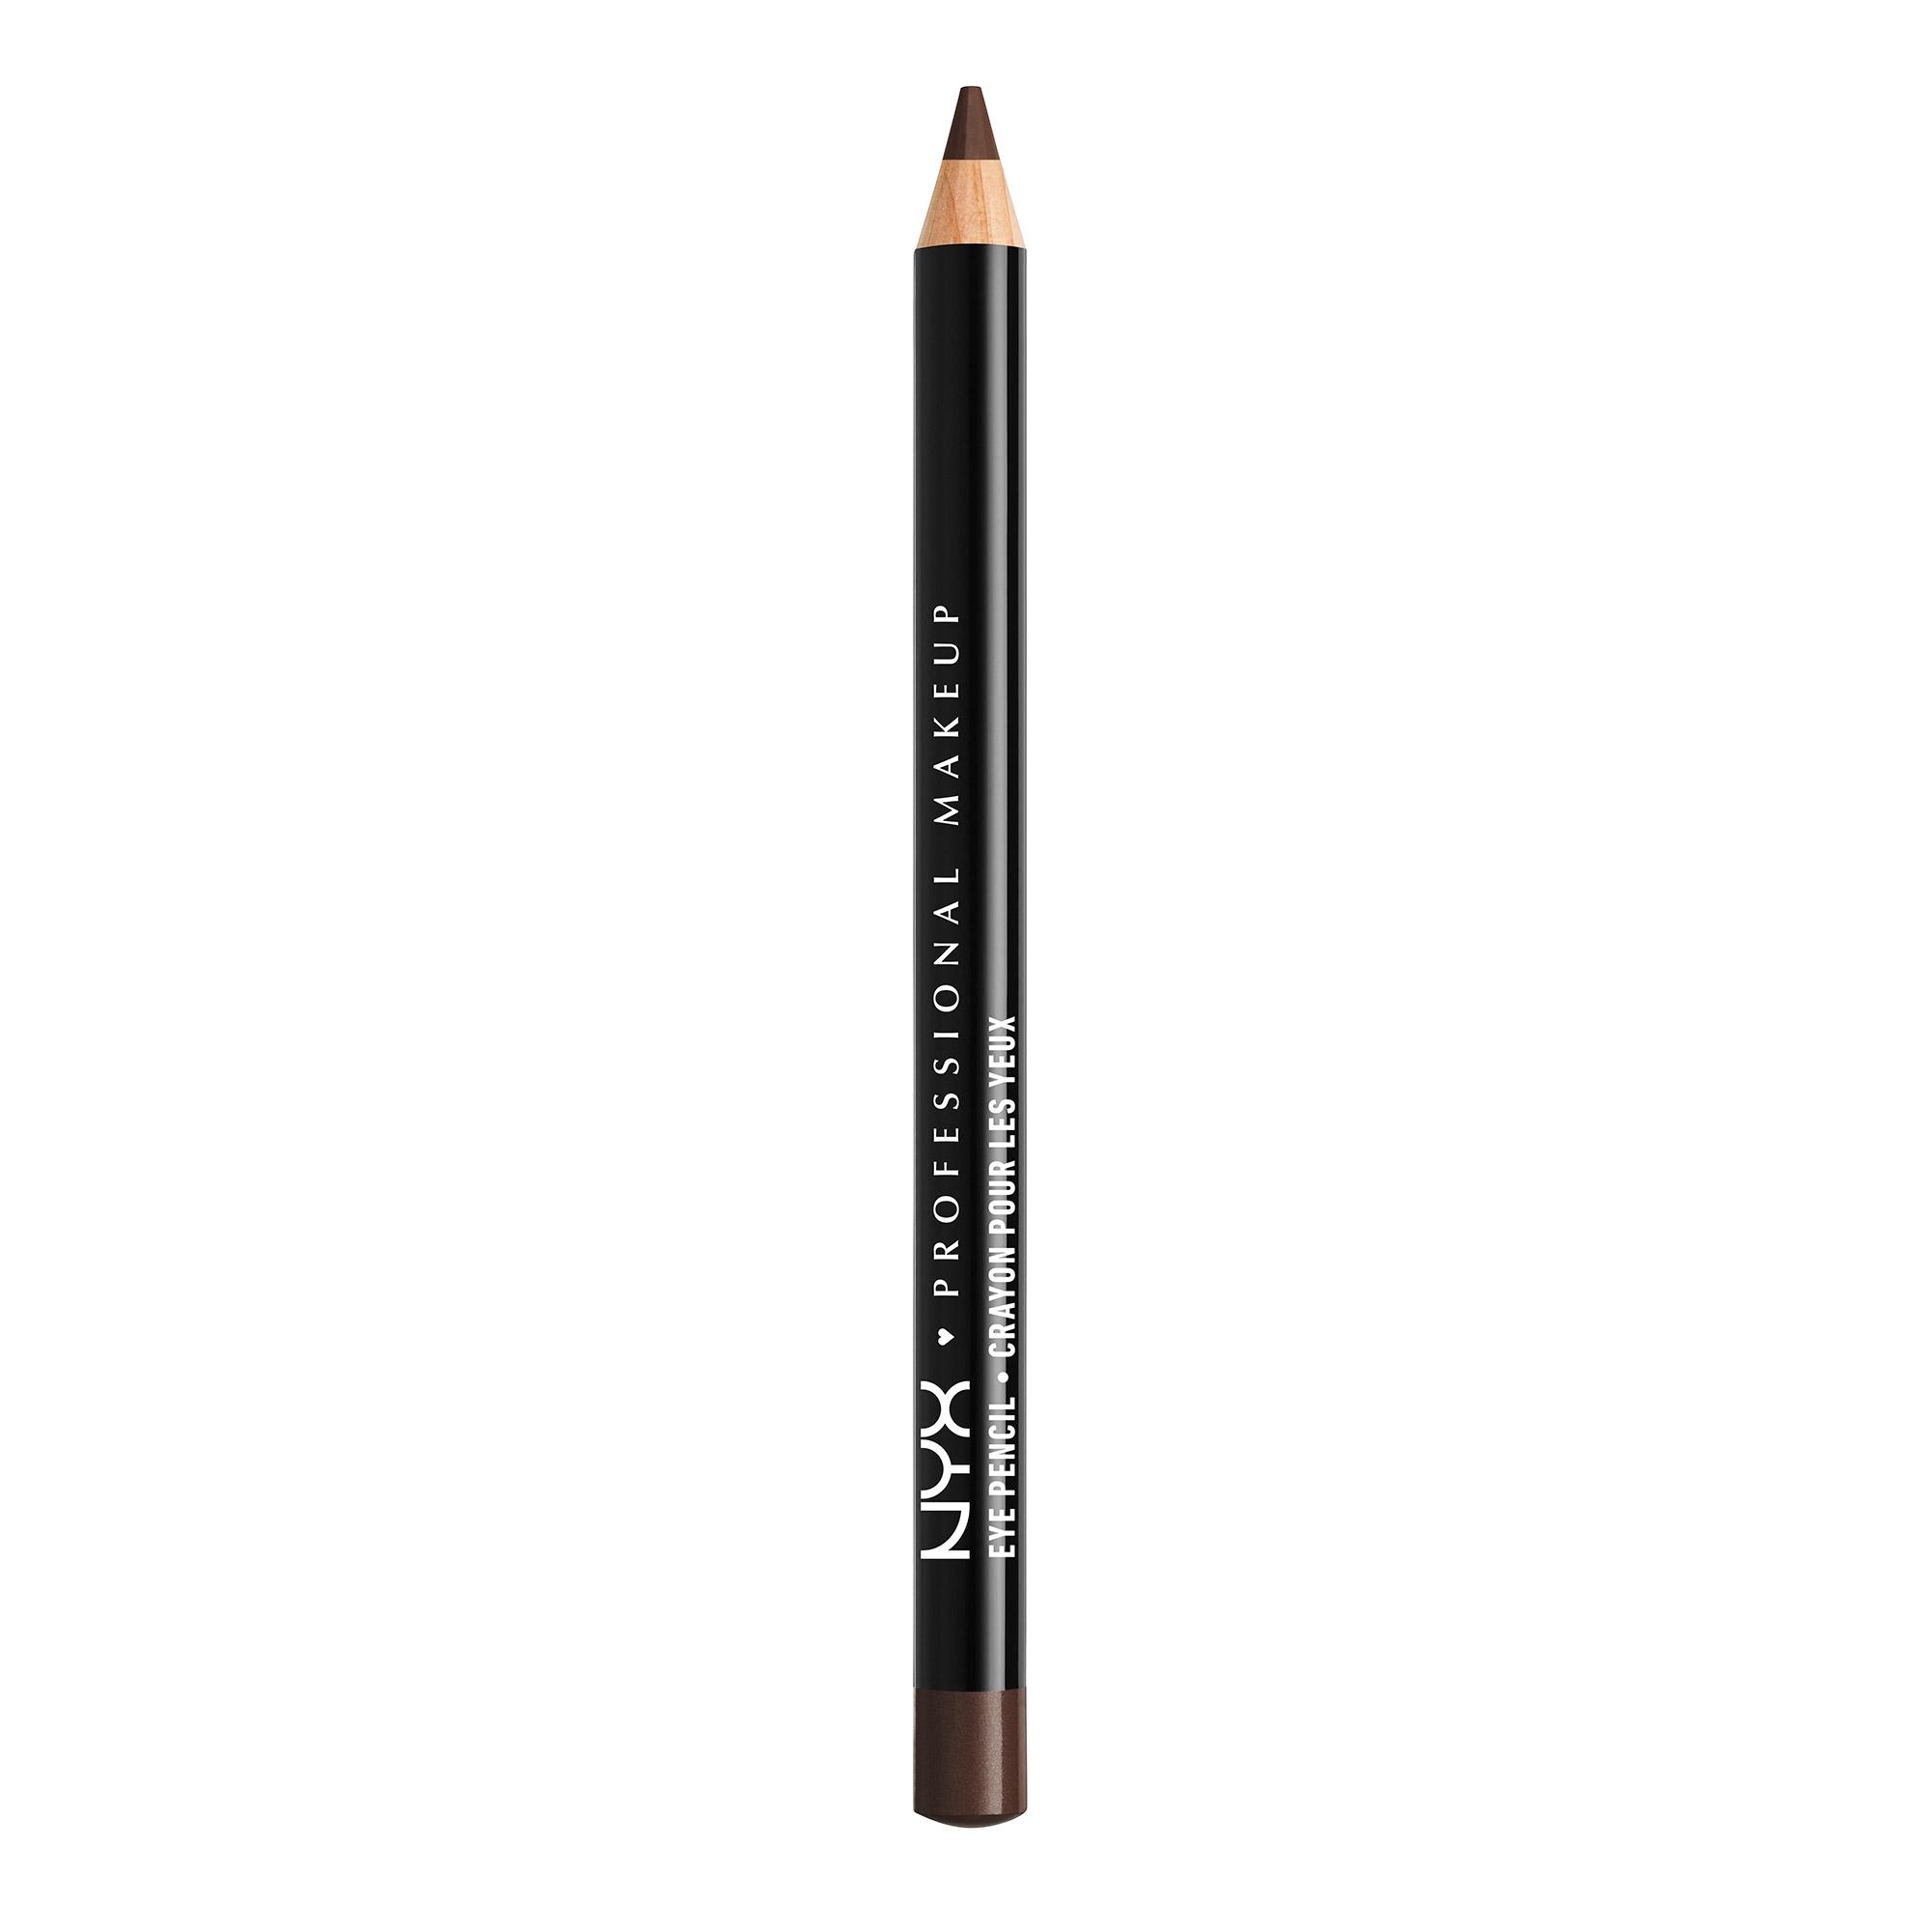 Карандаш для глаз NYX Professional Makeup Slim Eye Pencil 931 Black Brown 1г